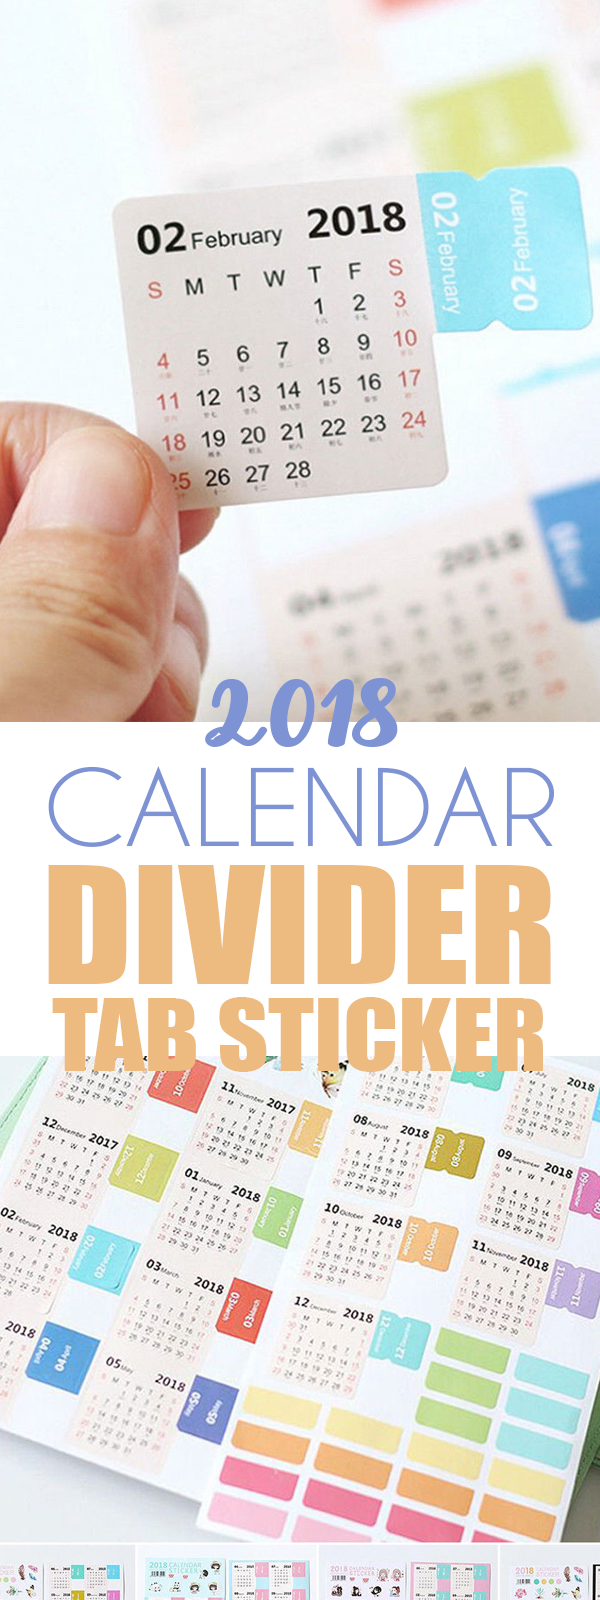 calendar divider tab sticker planner bullet journal bullet